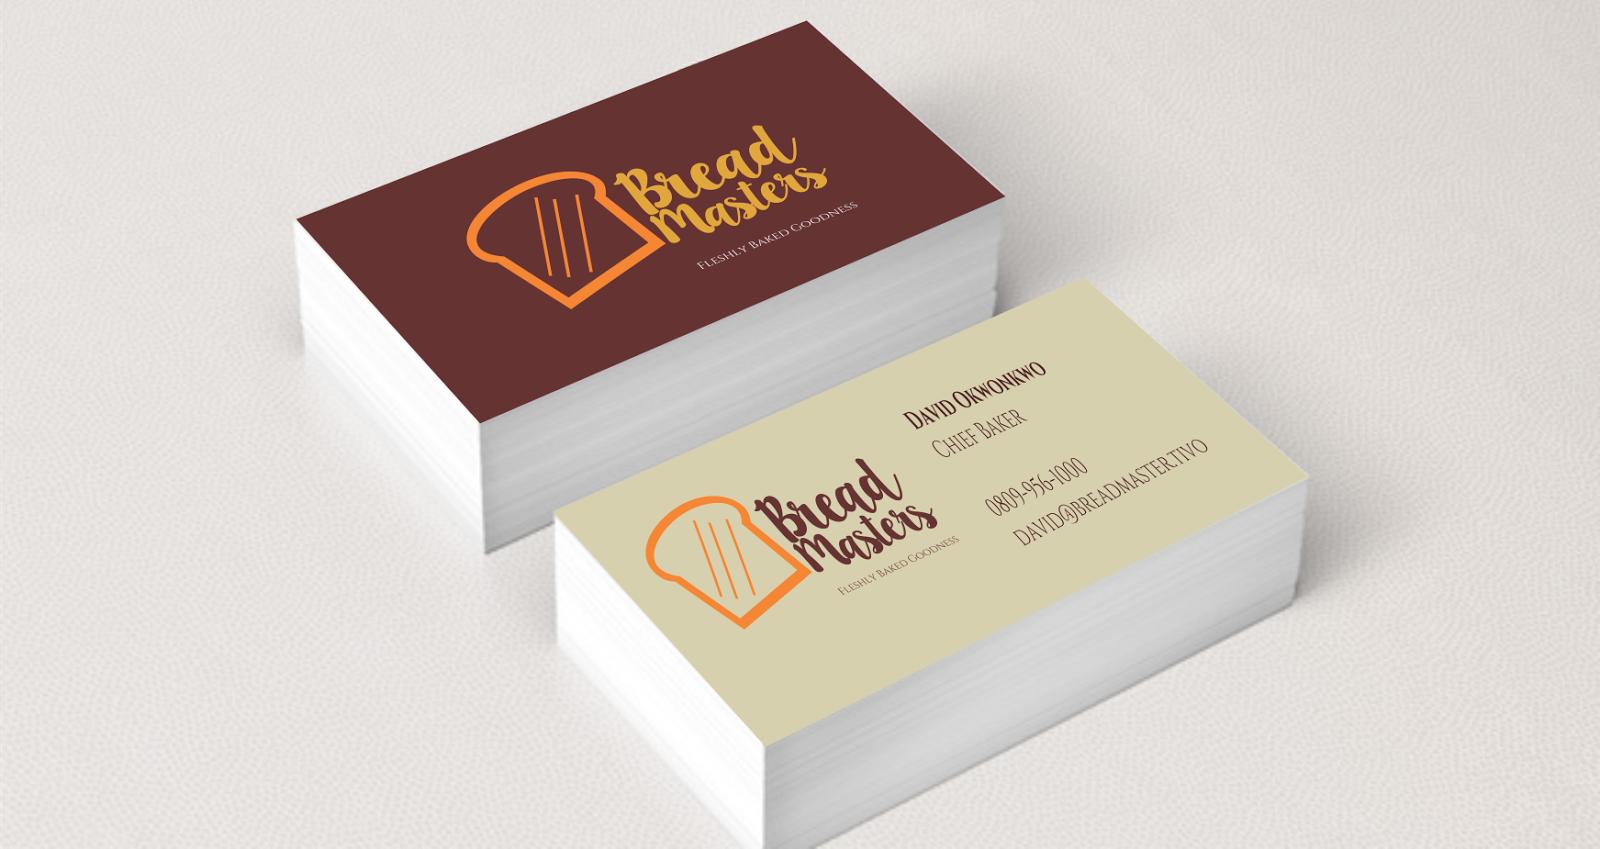 Business card printing fairfax va choice image card design and business card printing bolton image collections card design and business card printing bolton image collections card reheart Images